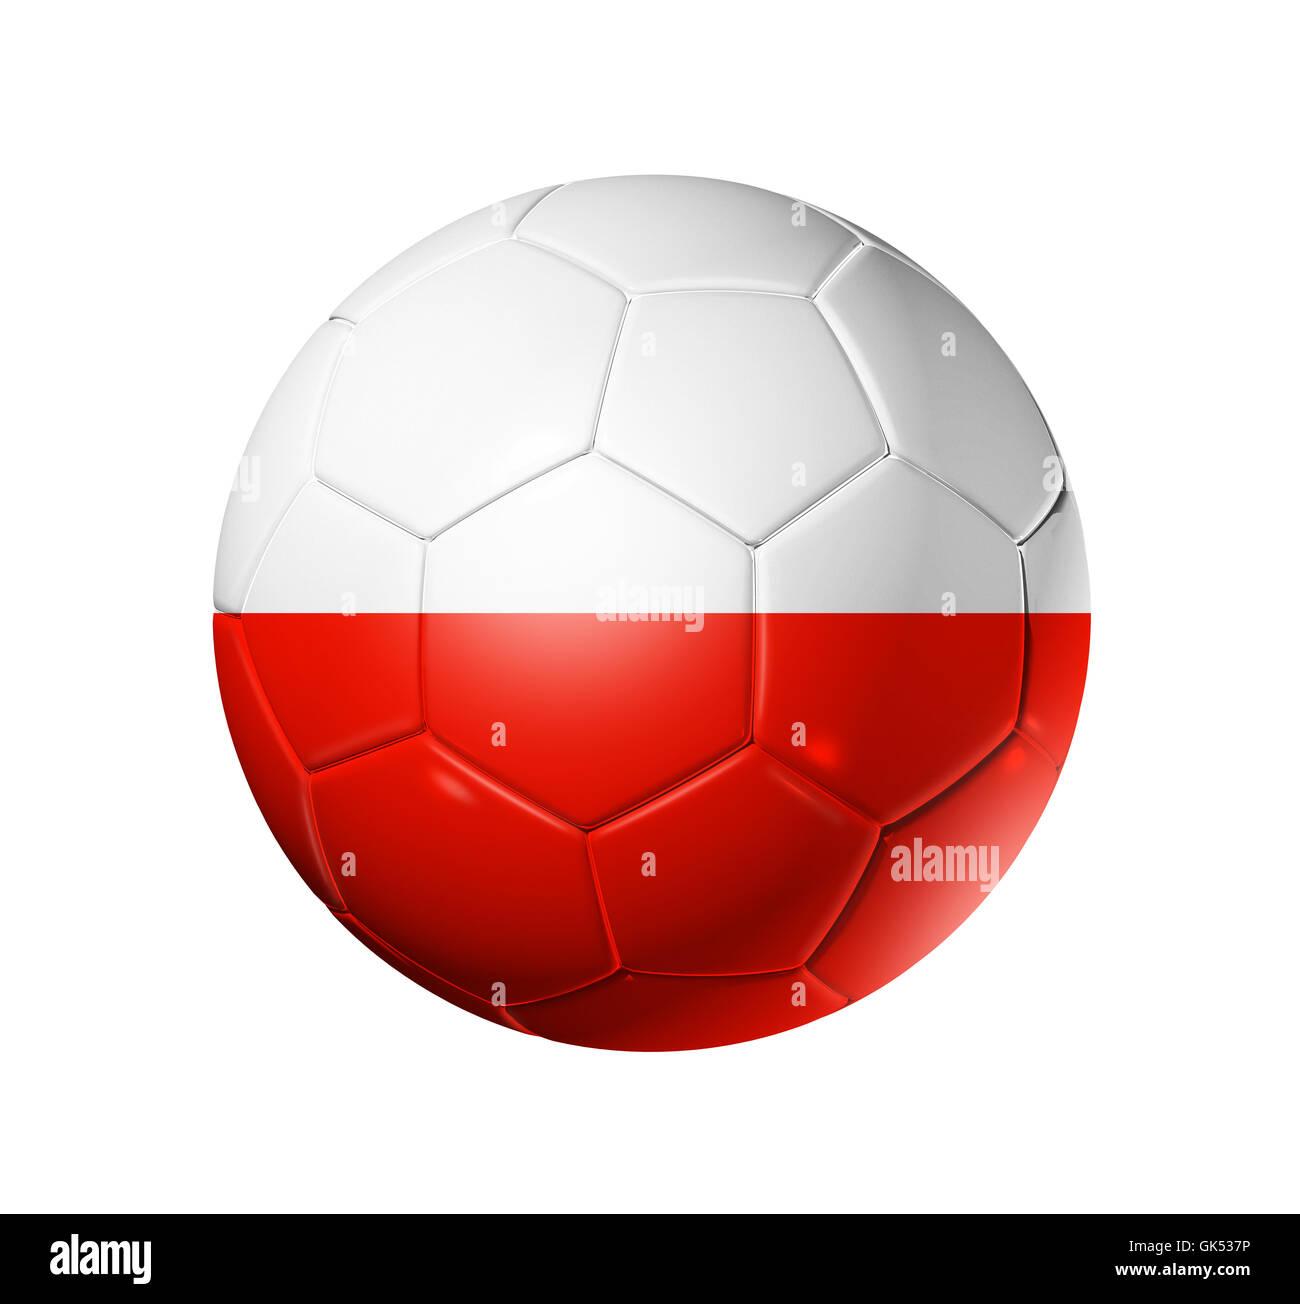 polish flag on football stock photos u0026 polish flag on football